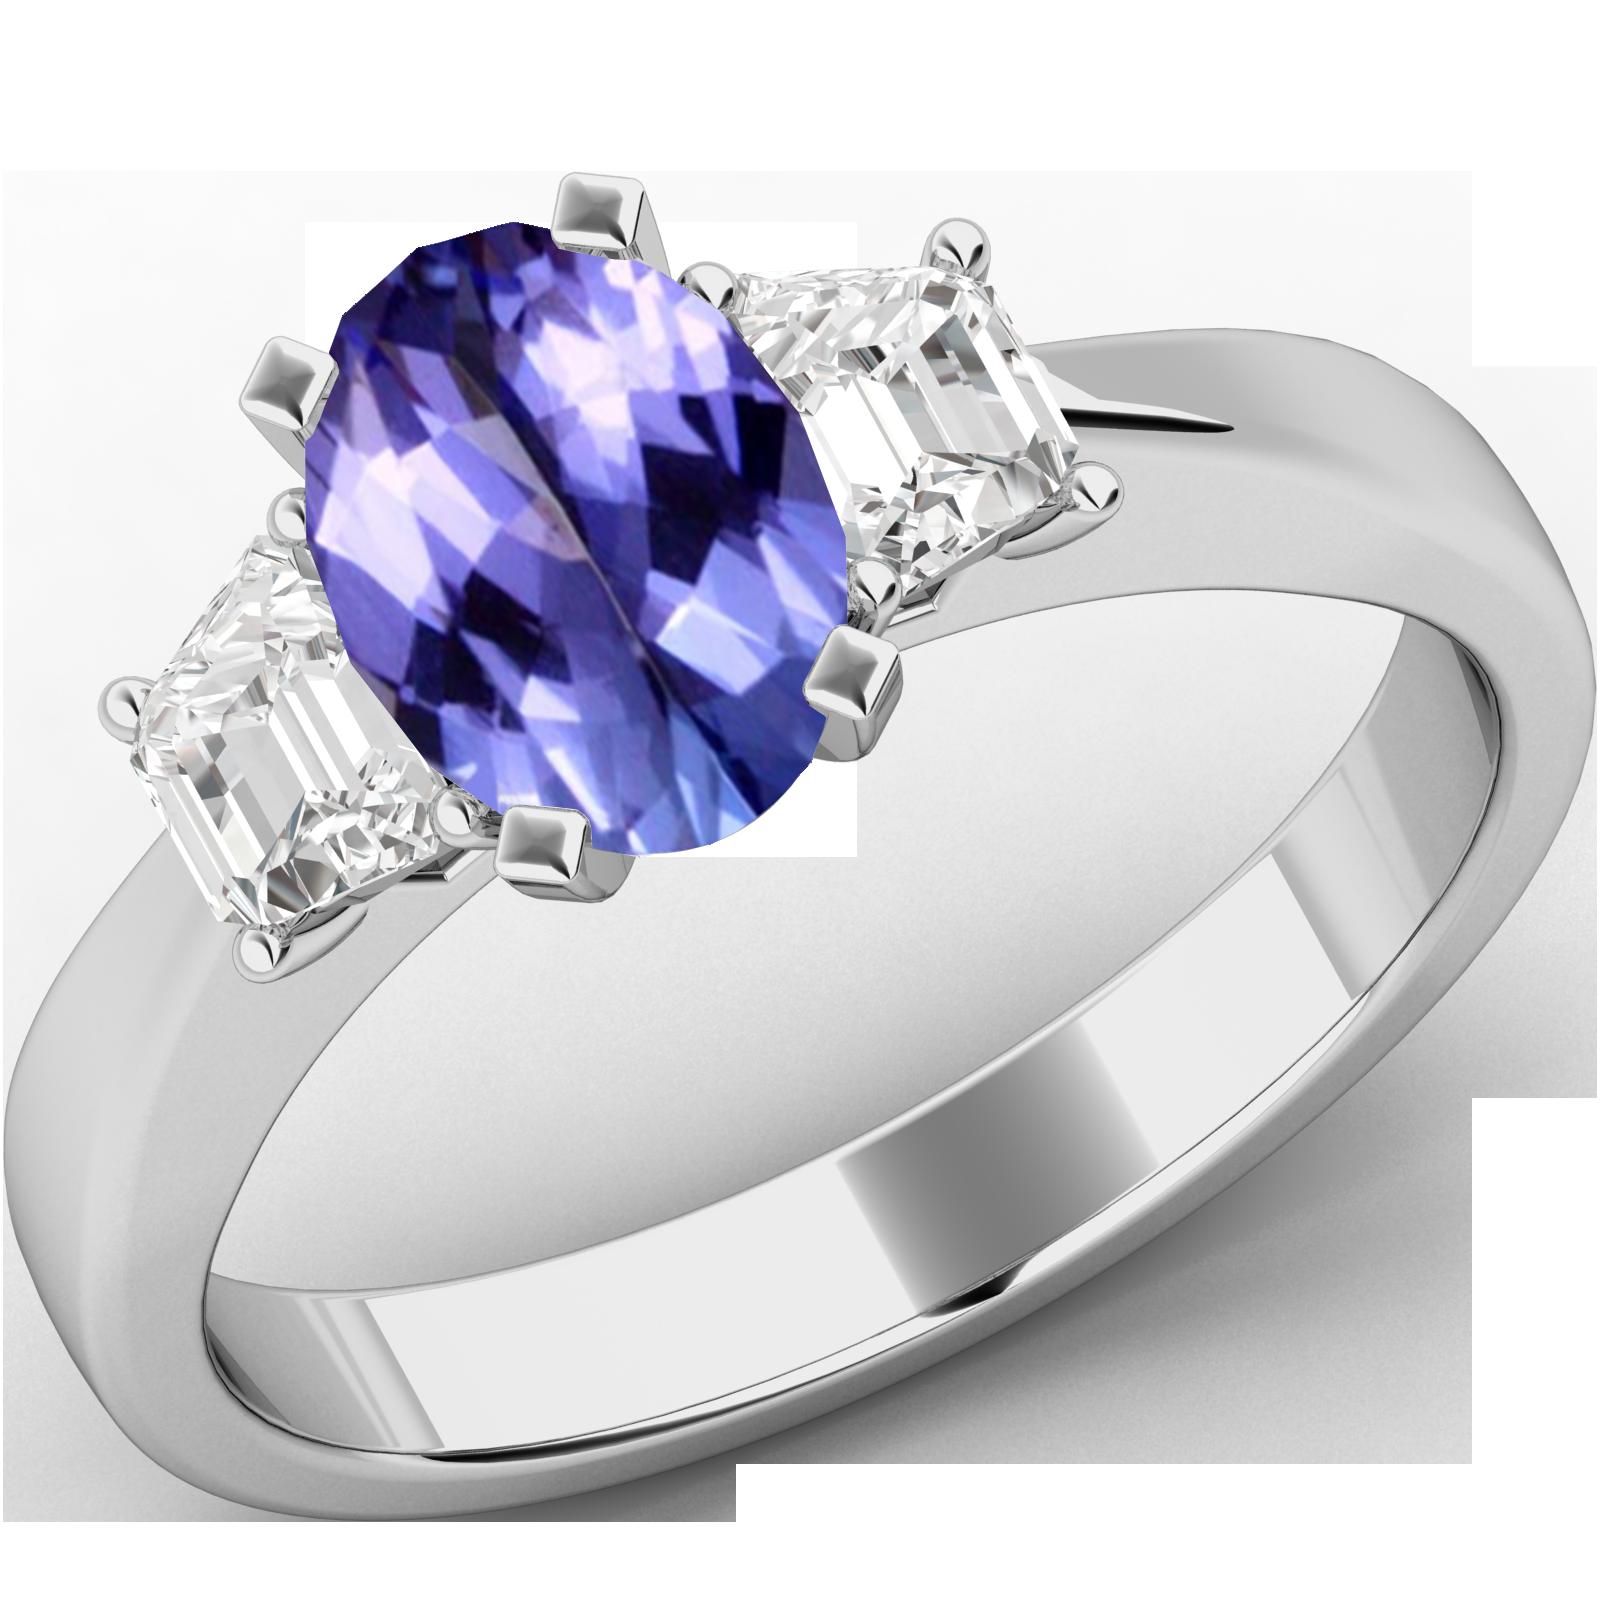 Inel de Logodna cu Tanzanit si 2 Diamante Dama Aur Alb 18kt cu un Tanzanit Central Forma Ovala si Doua Diamante in Forma de Trapez-img1